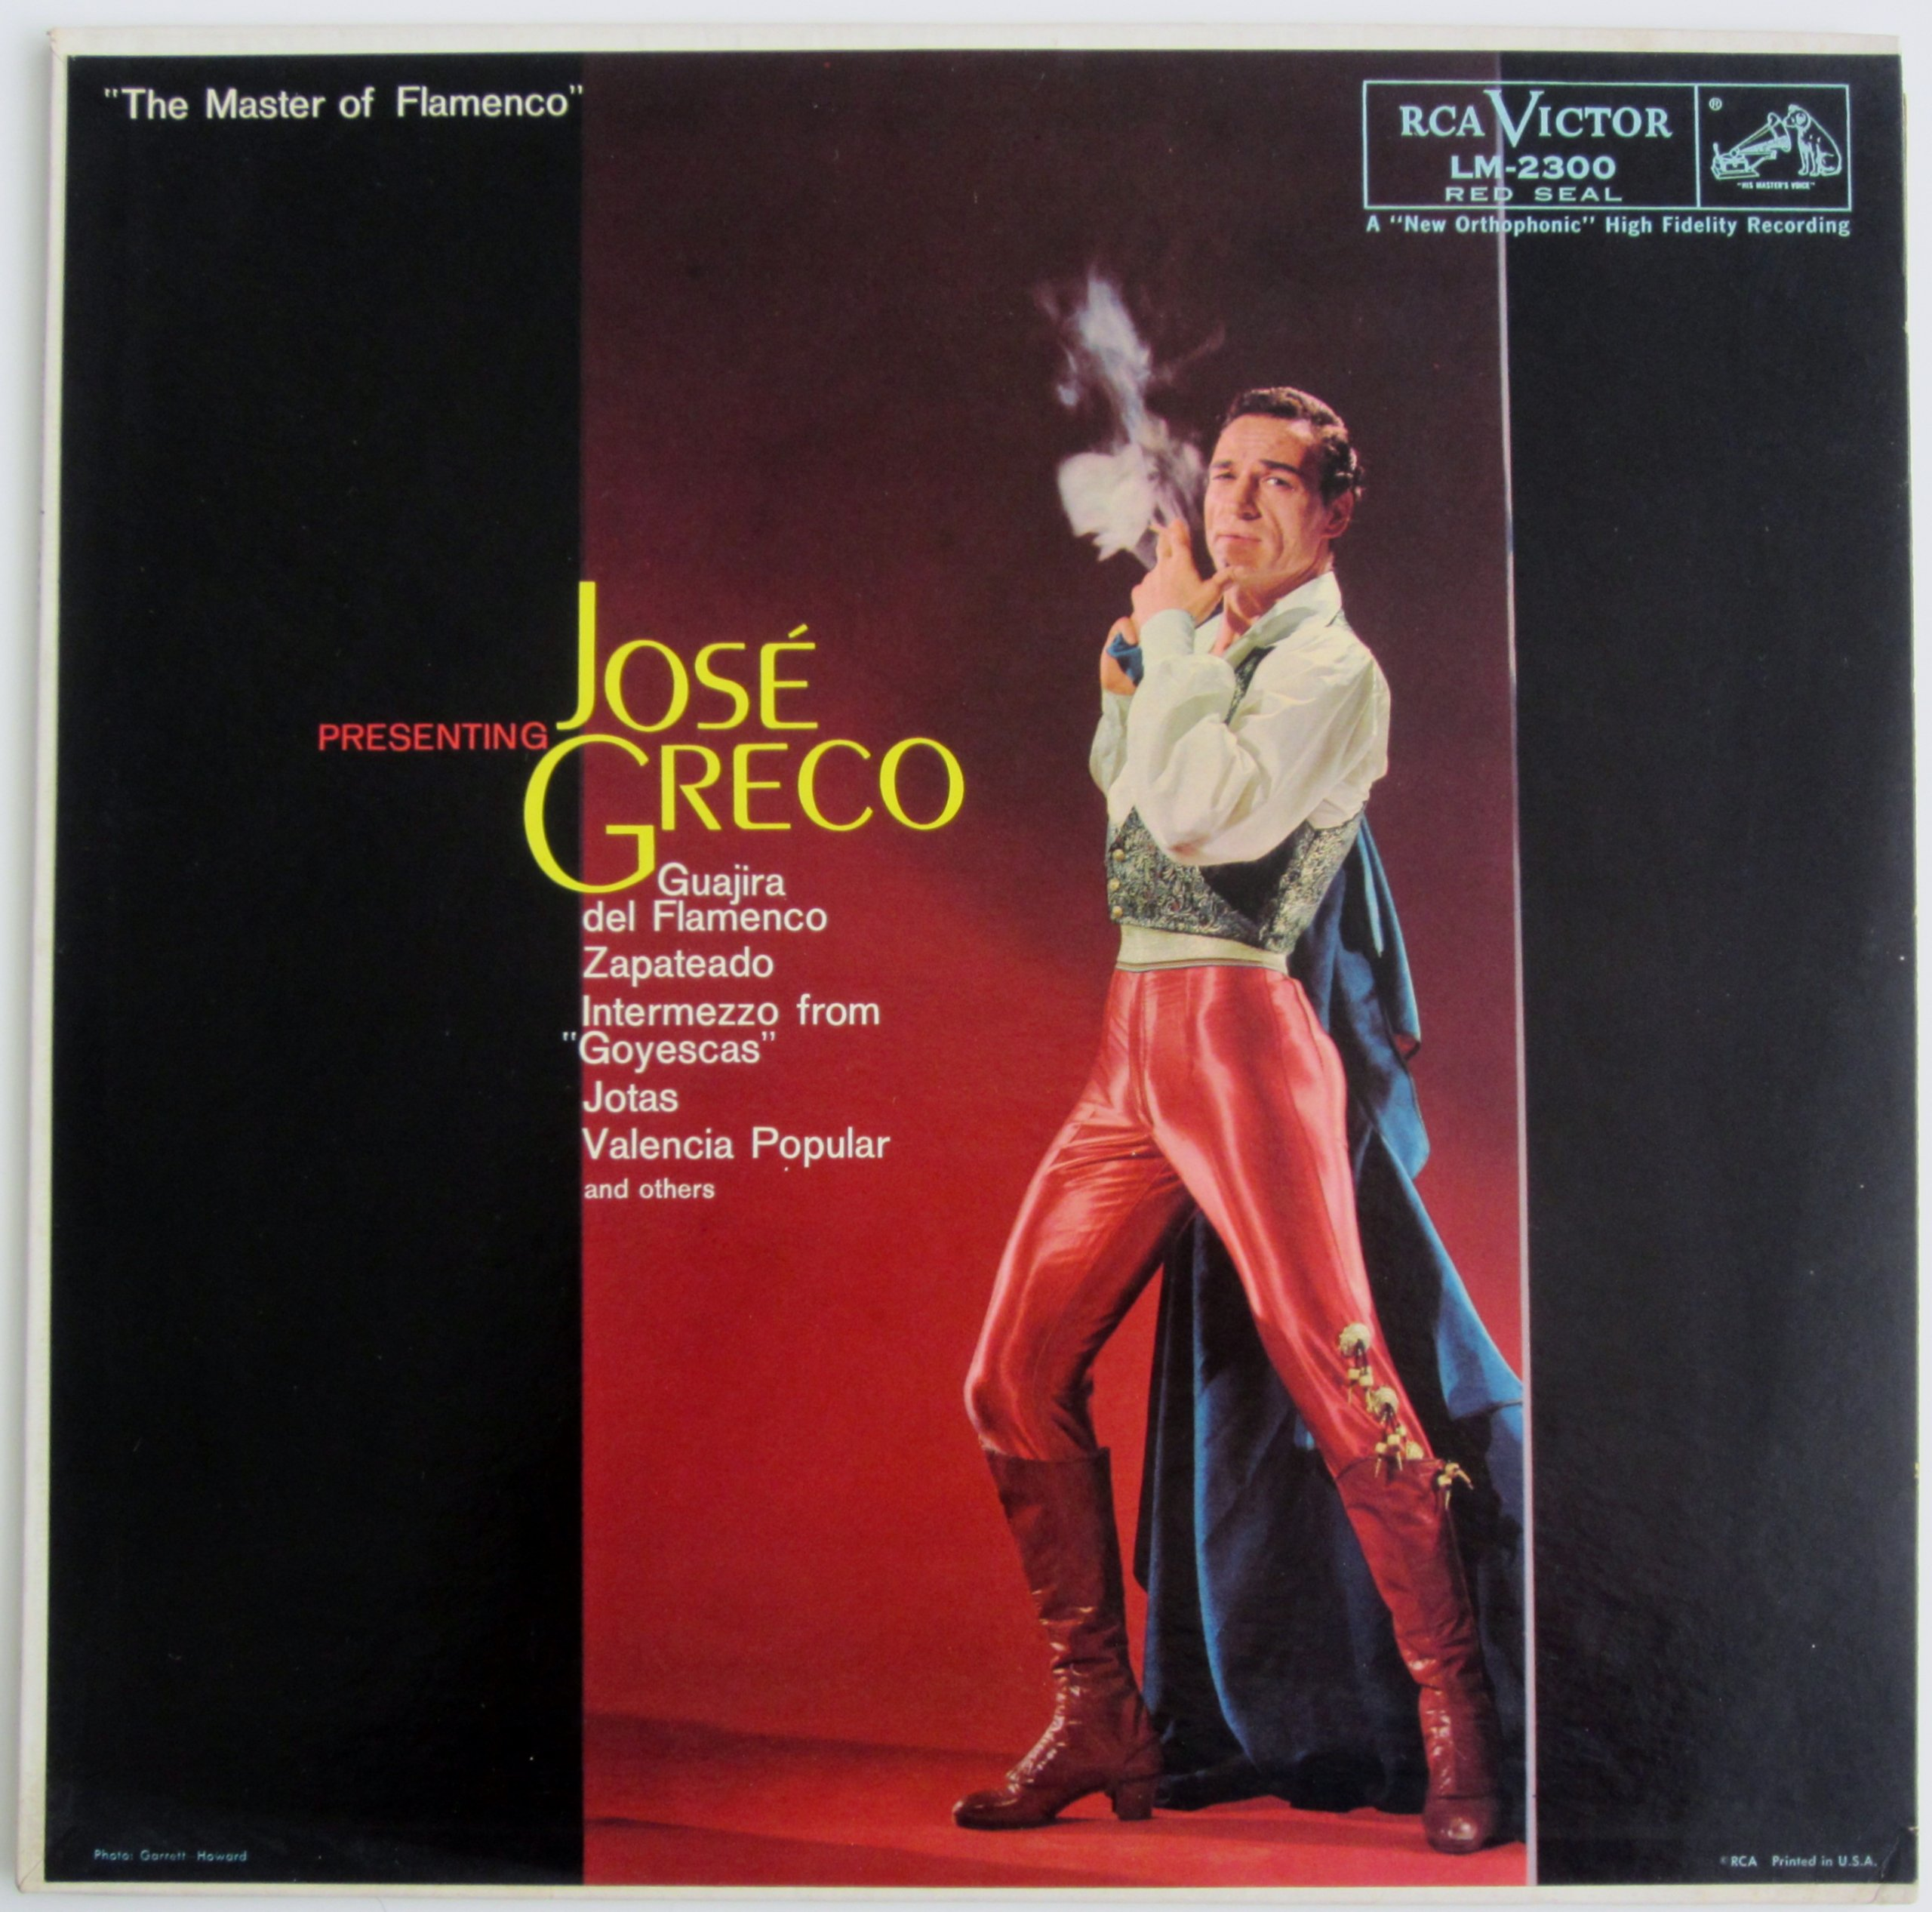 Presenting Jose Greco ''The Master of Flamenco'' and His Company